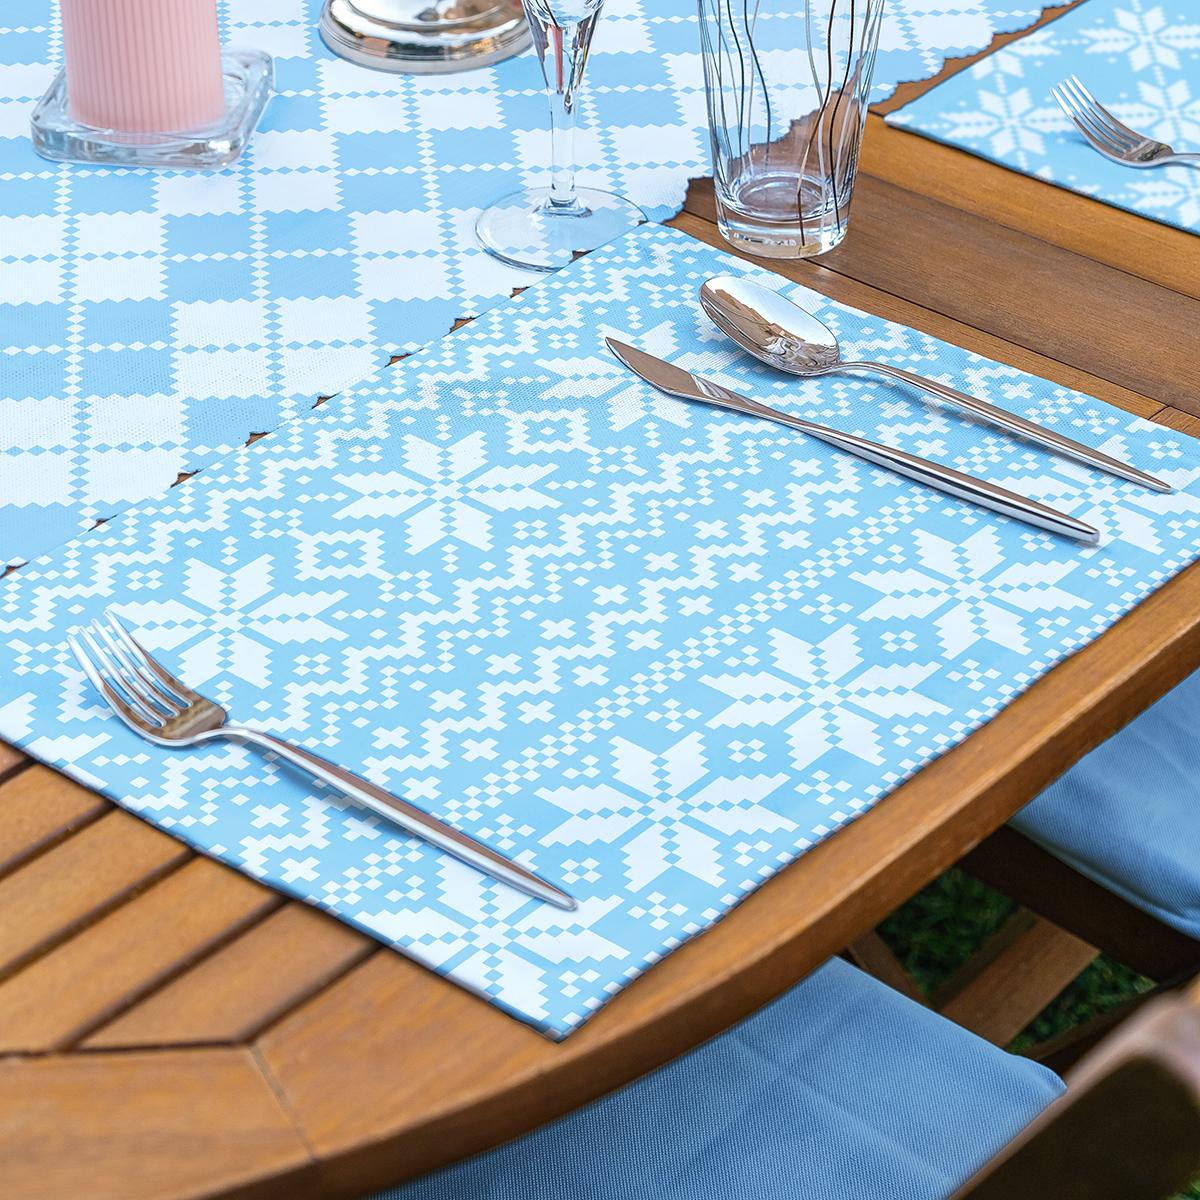 4+1 Mavi Geometrik Baklama Desen Motifli Amerikan Servis & Runner Seti Realhomes